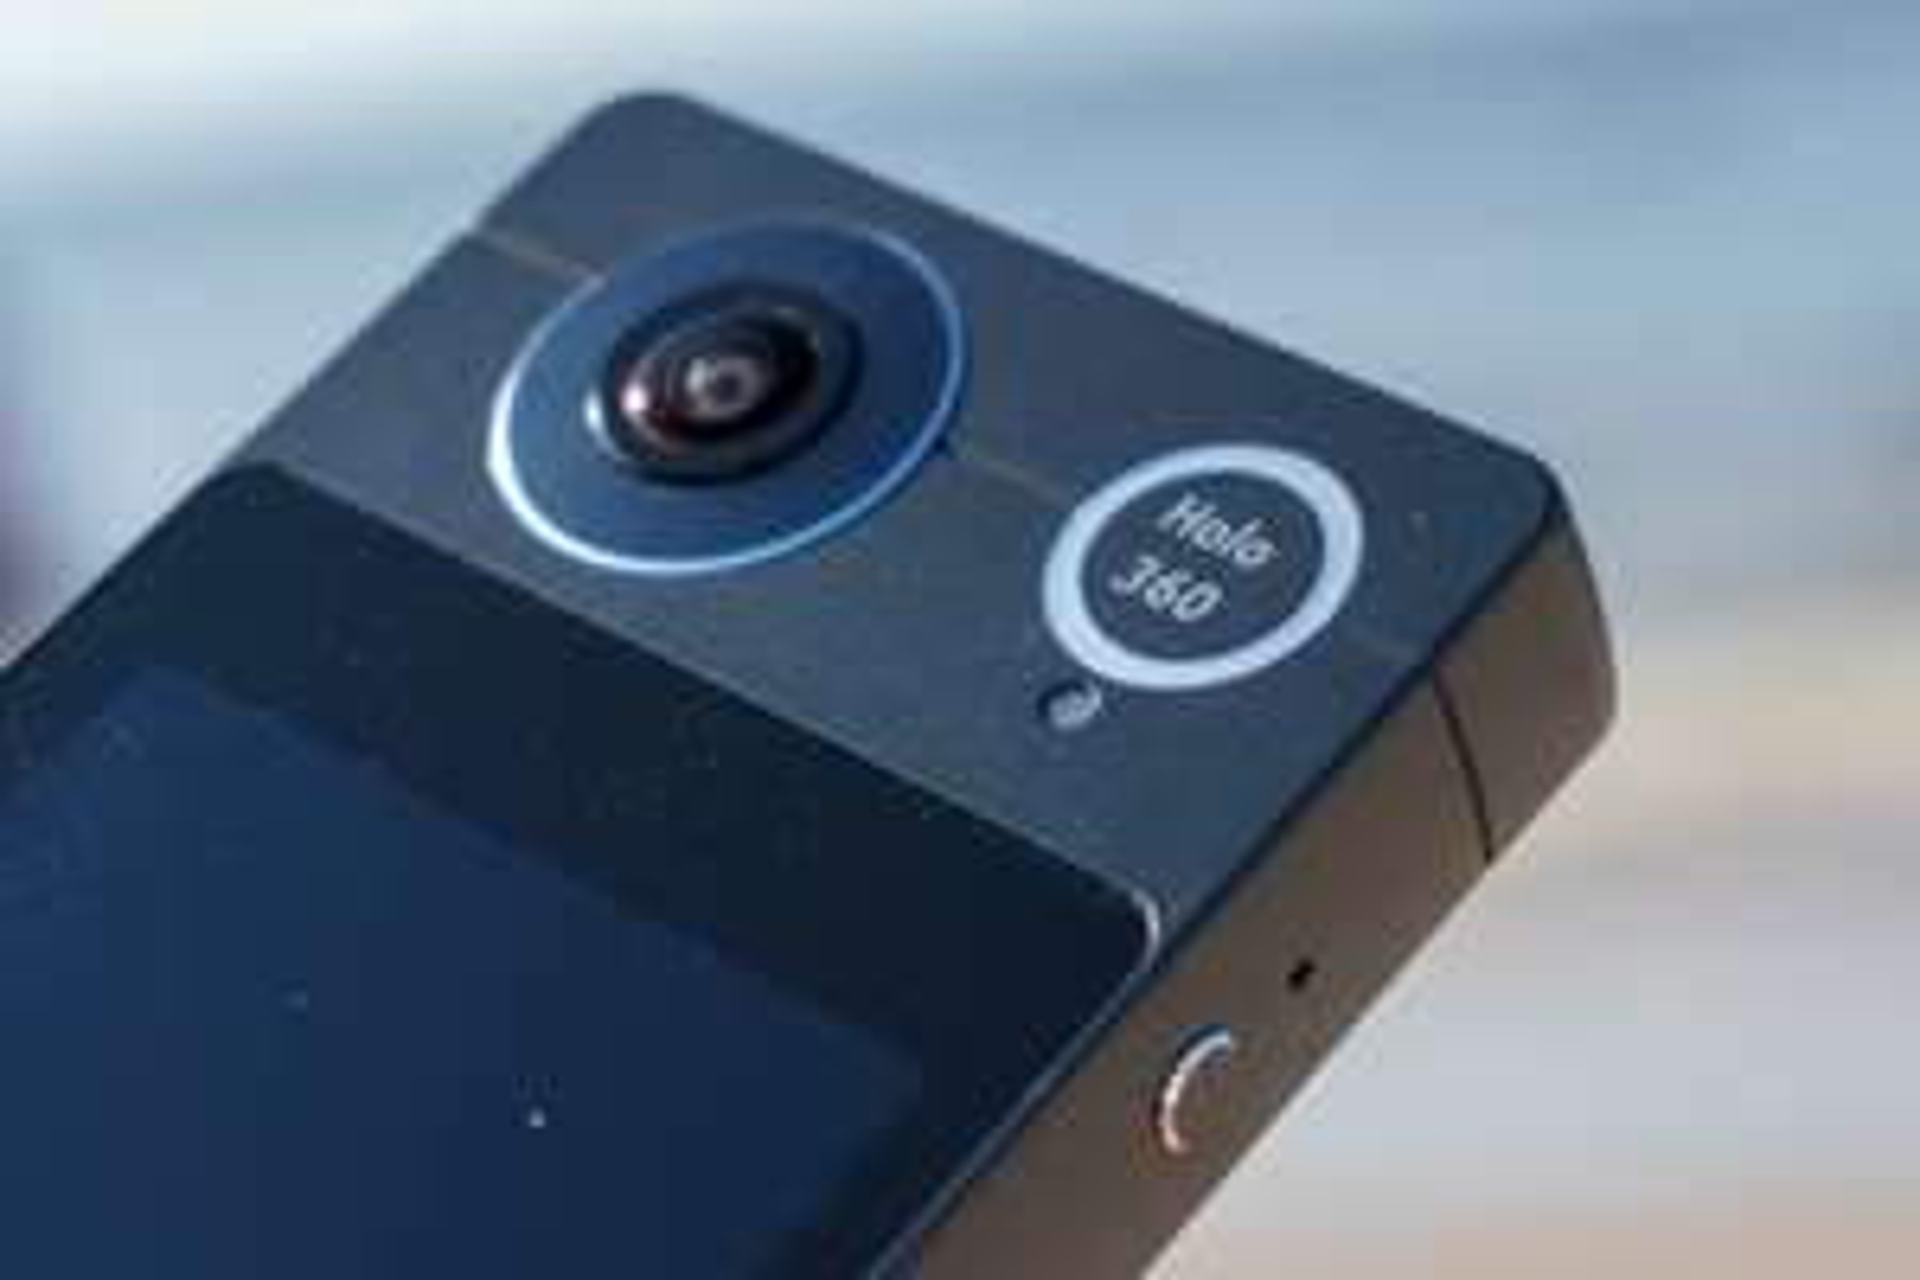 Holo360 Acer kamera aparat android